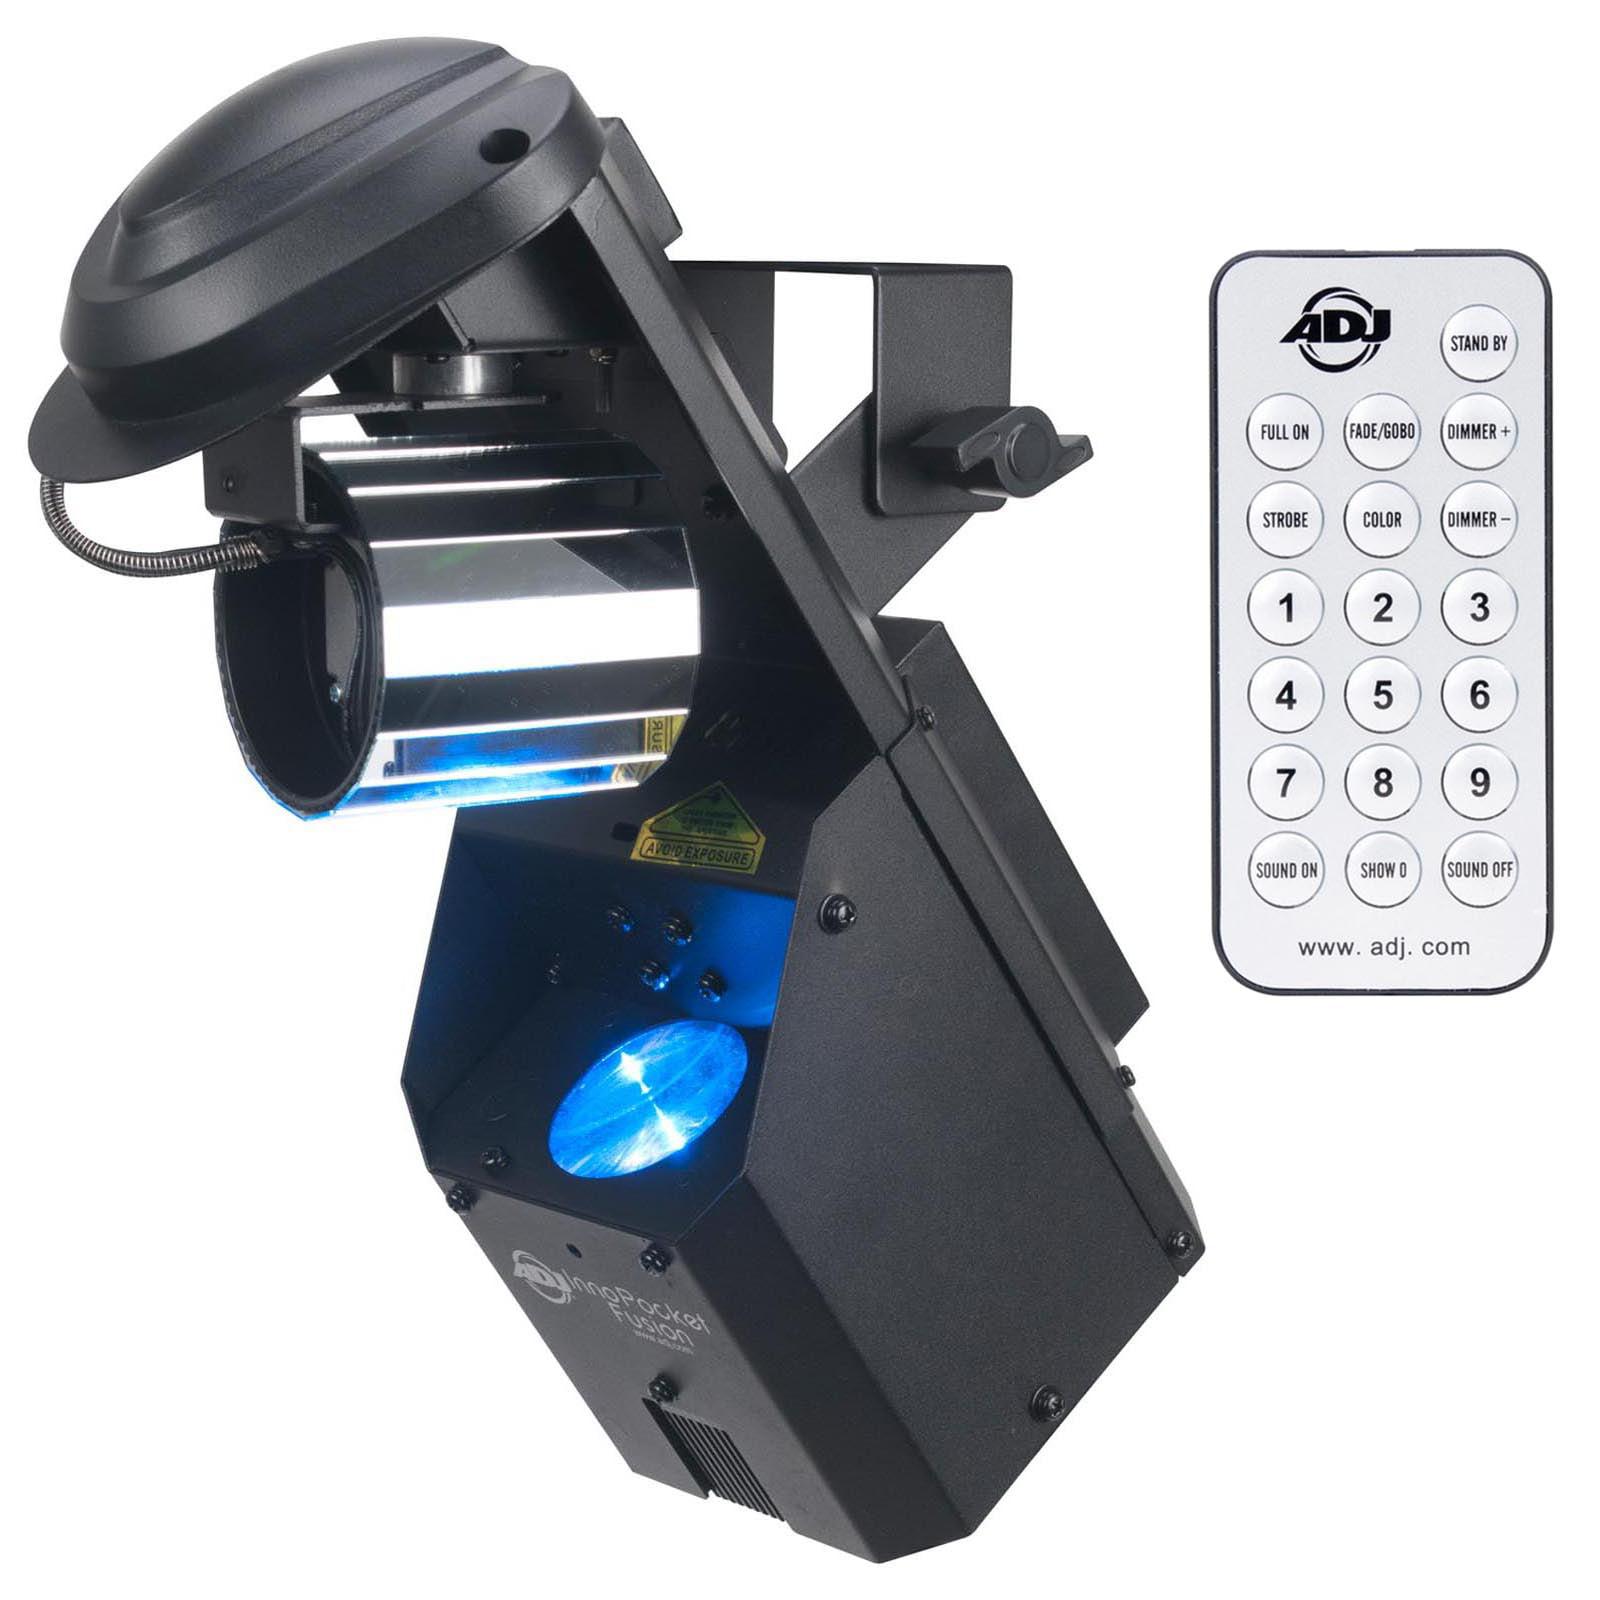 American Dj Inno Pocket Fusion Laser Light Effect + Wirel...